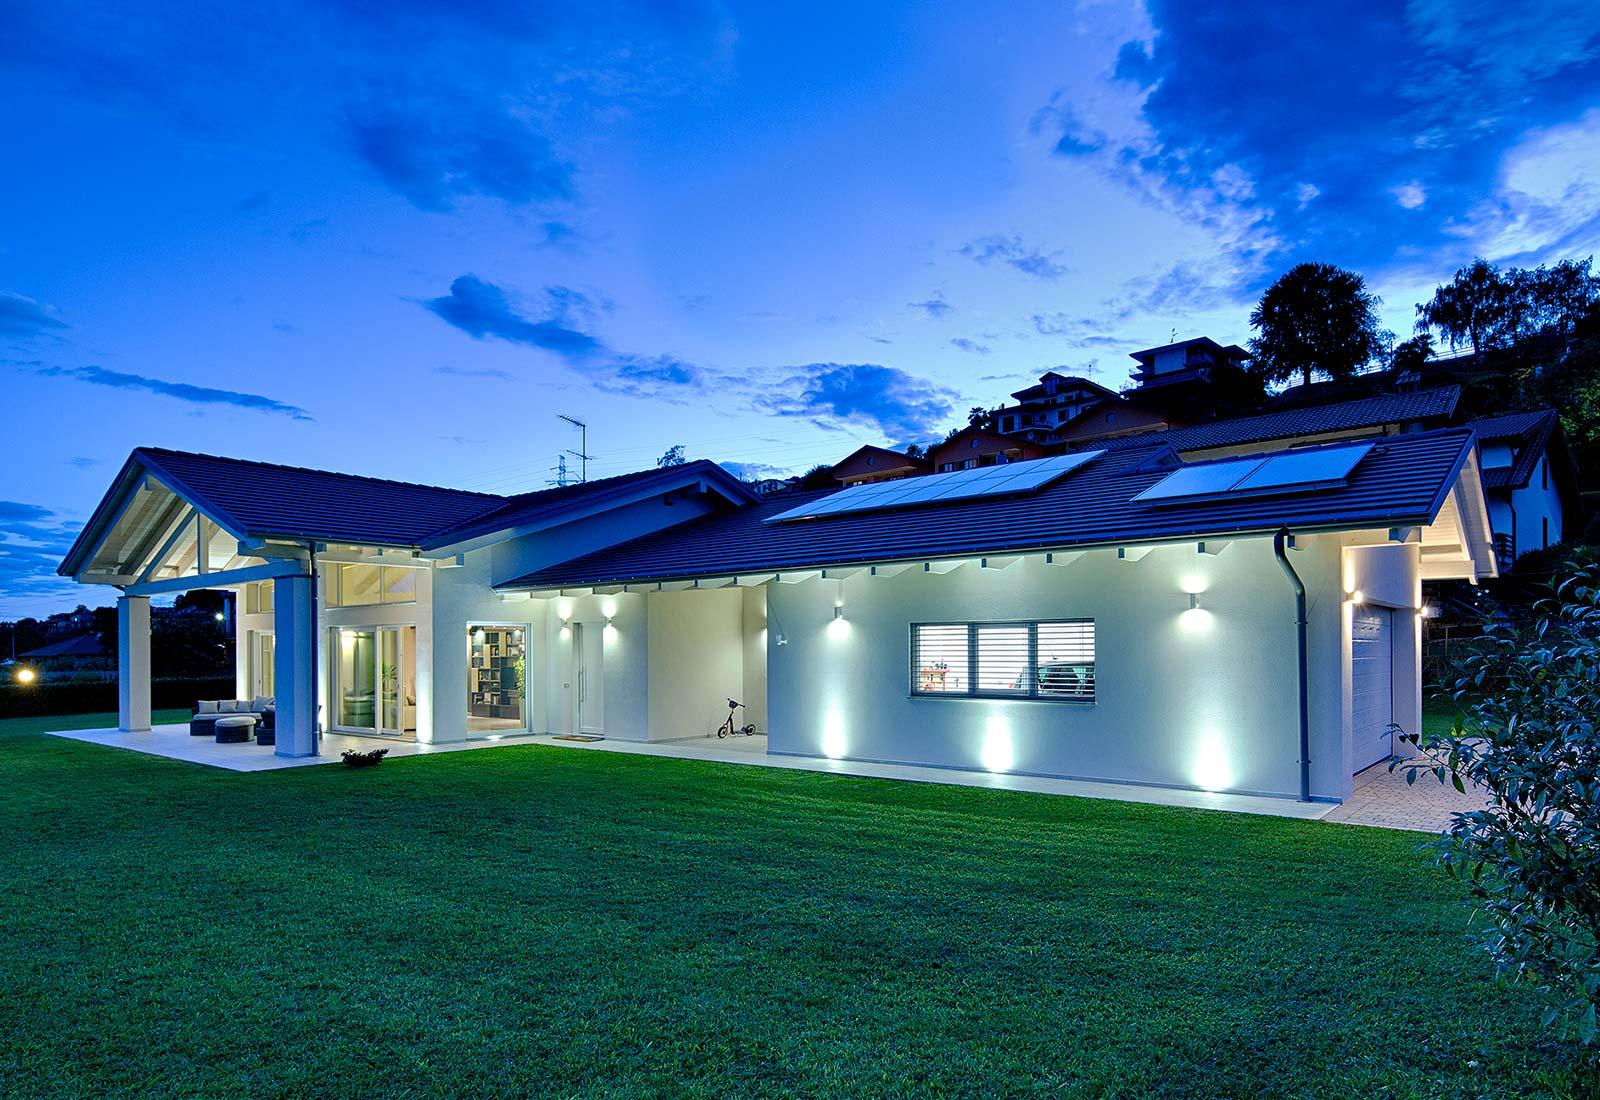 Casa-in-legno-Nebbiuno-Novara-Kager-Italia-15